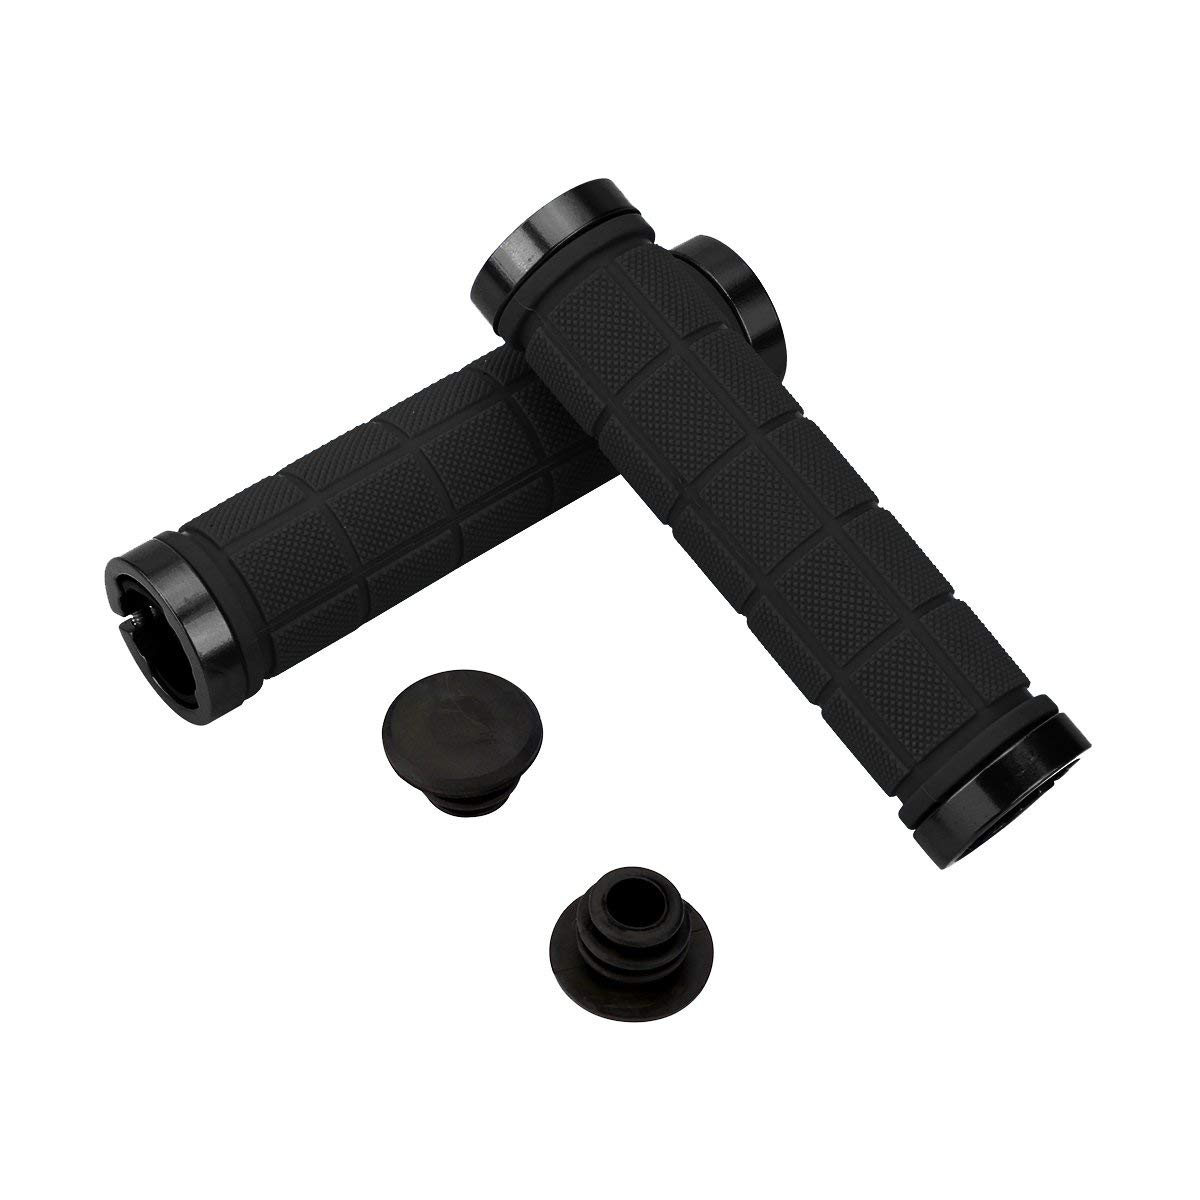 BMX Double Lock-on Bicycle Grip Handle Bar End Holding Locking Grips for MTB Folding Bike Mountain Downhill Bike Handlebar Grips